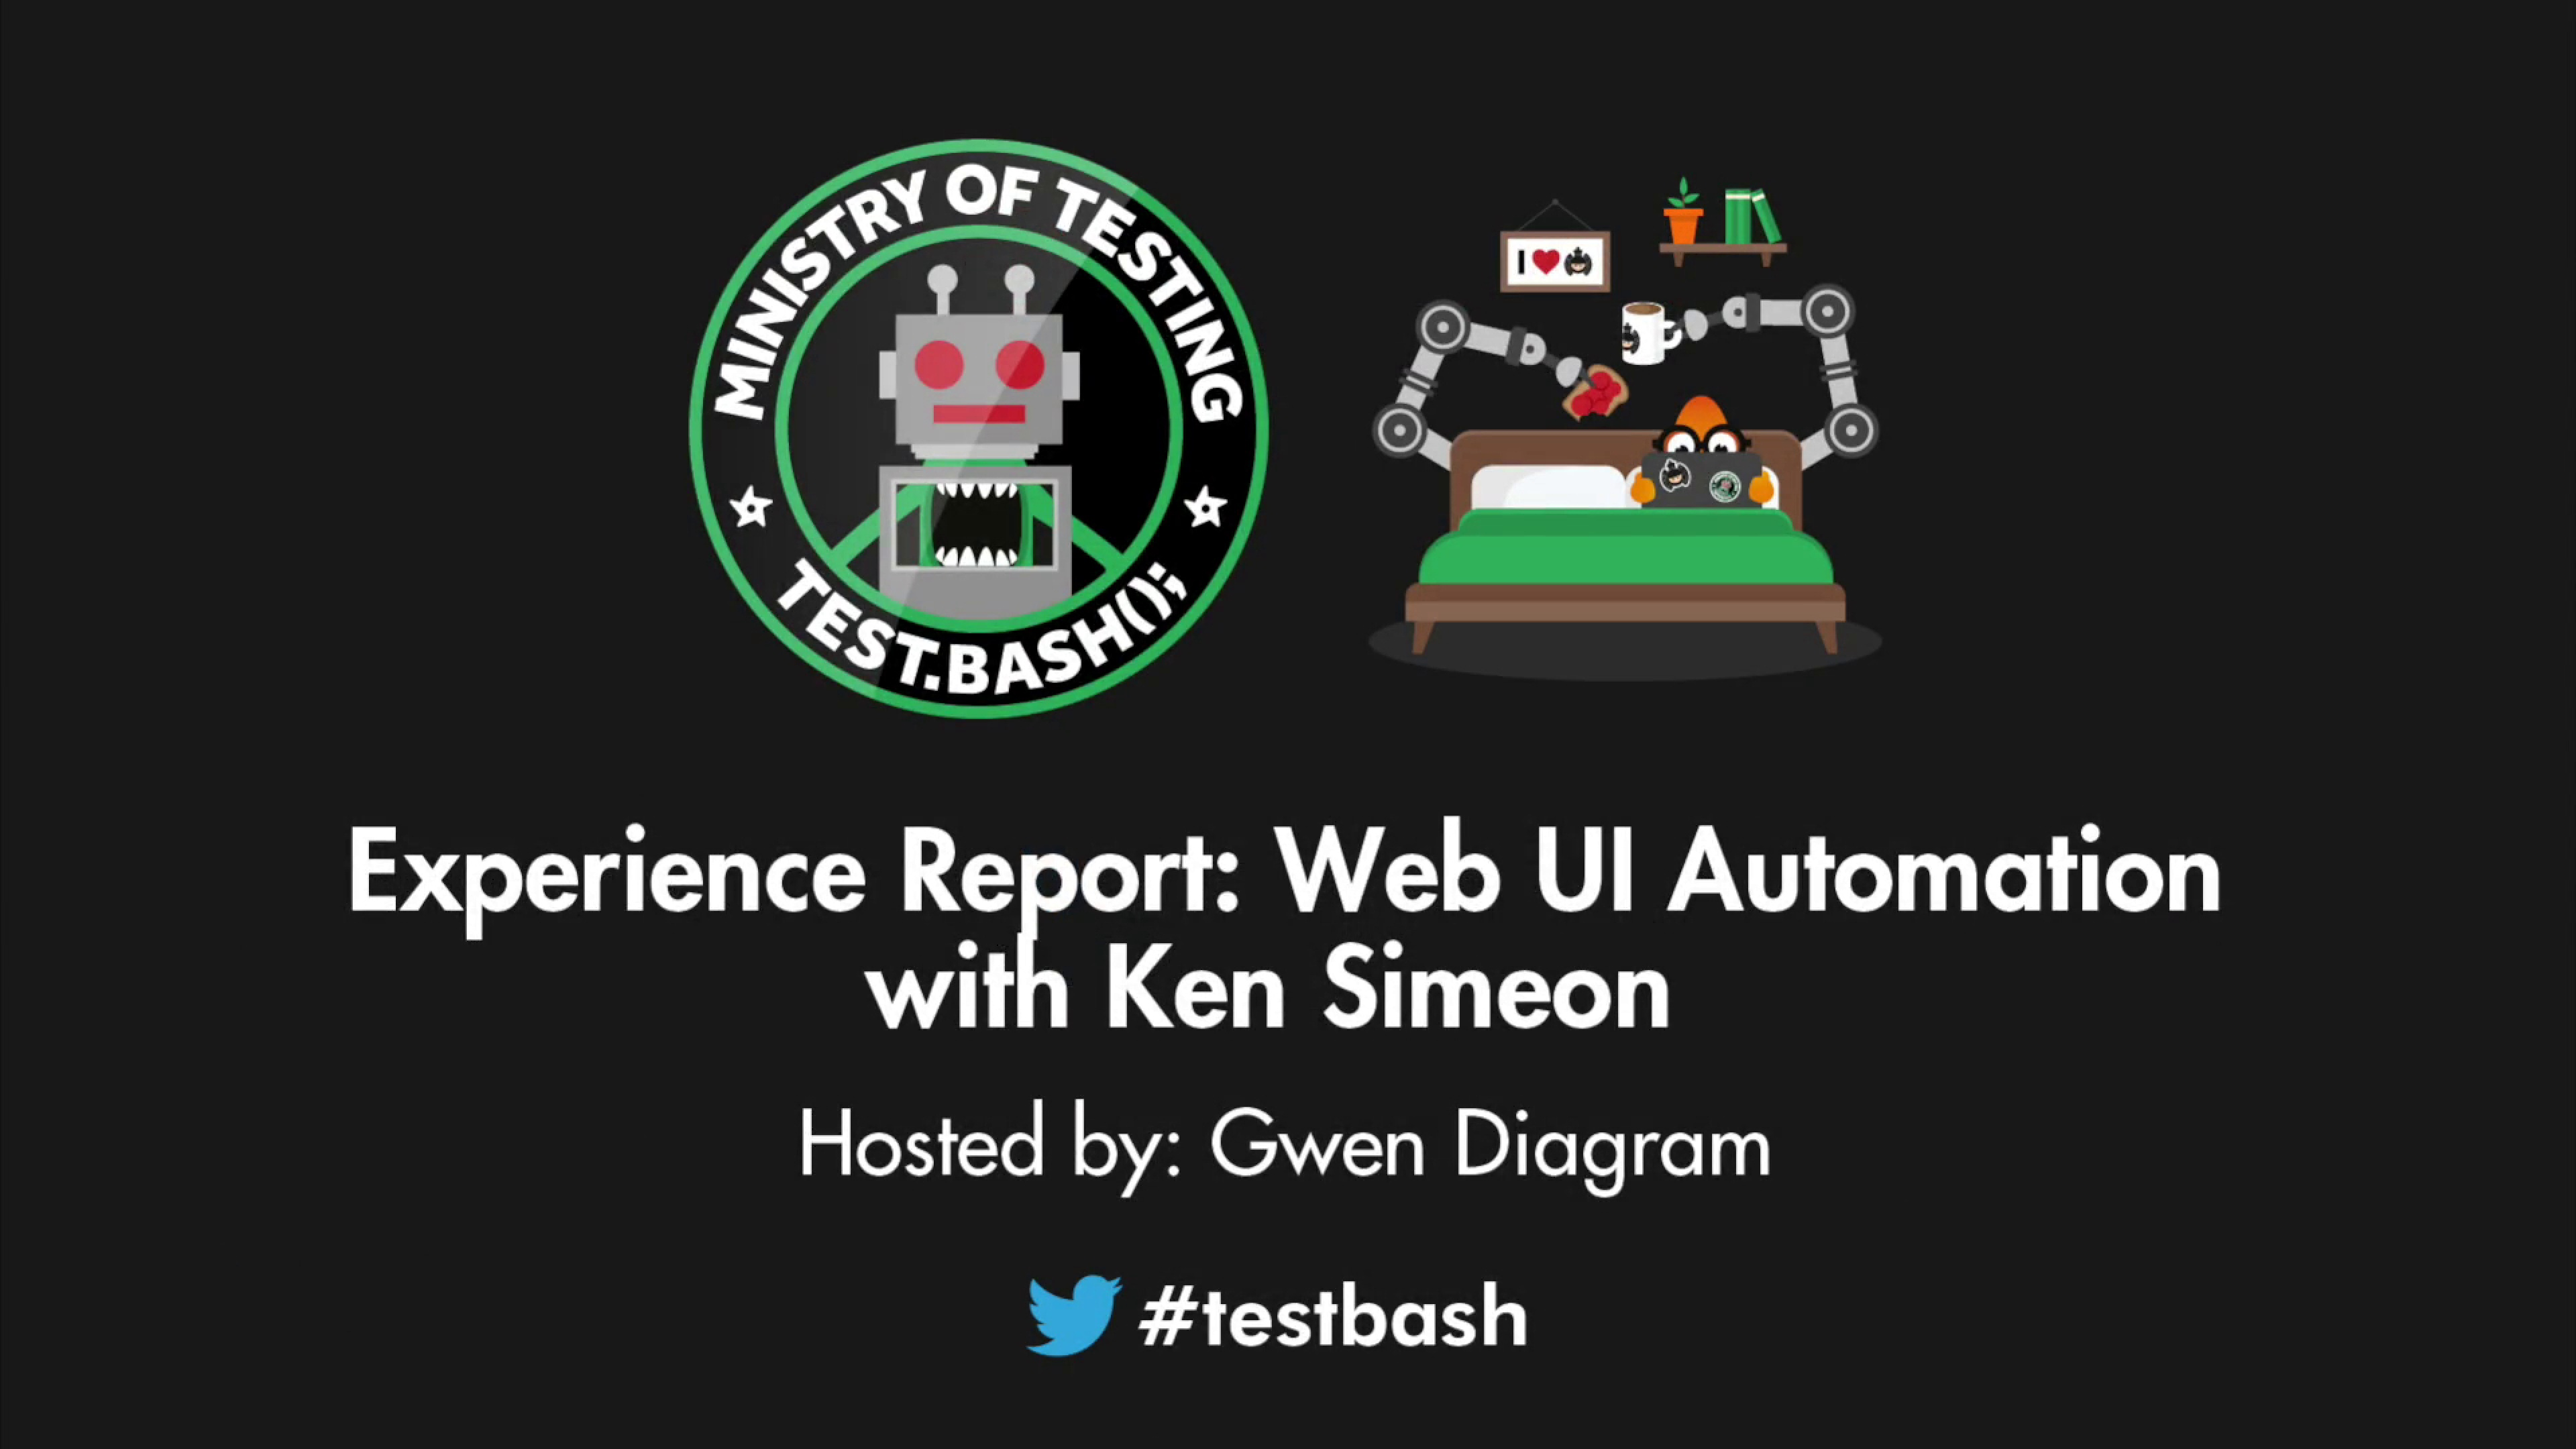 Experience Report: Web UI Automation - Ken Simeon